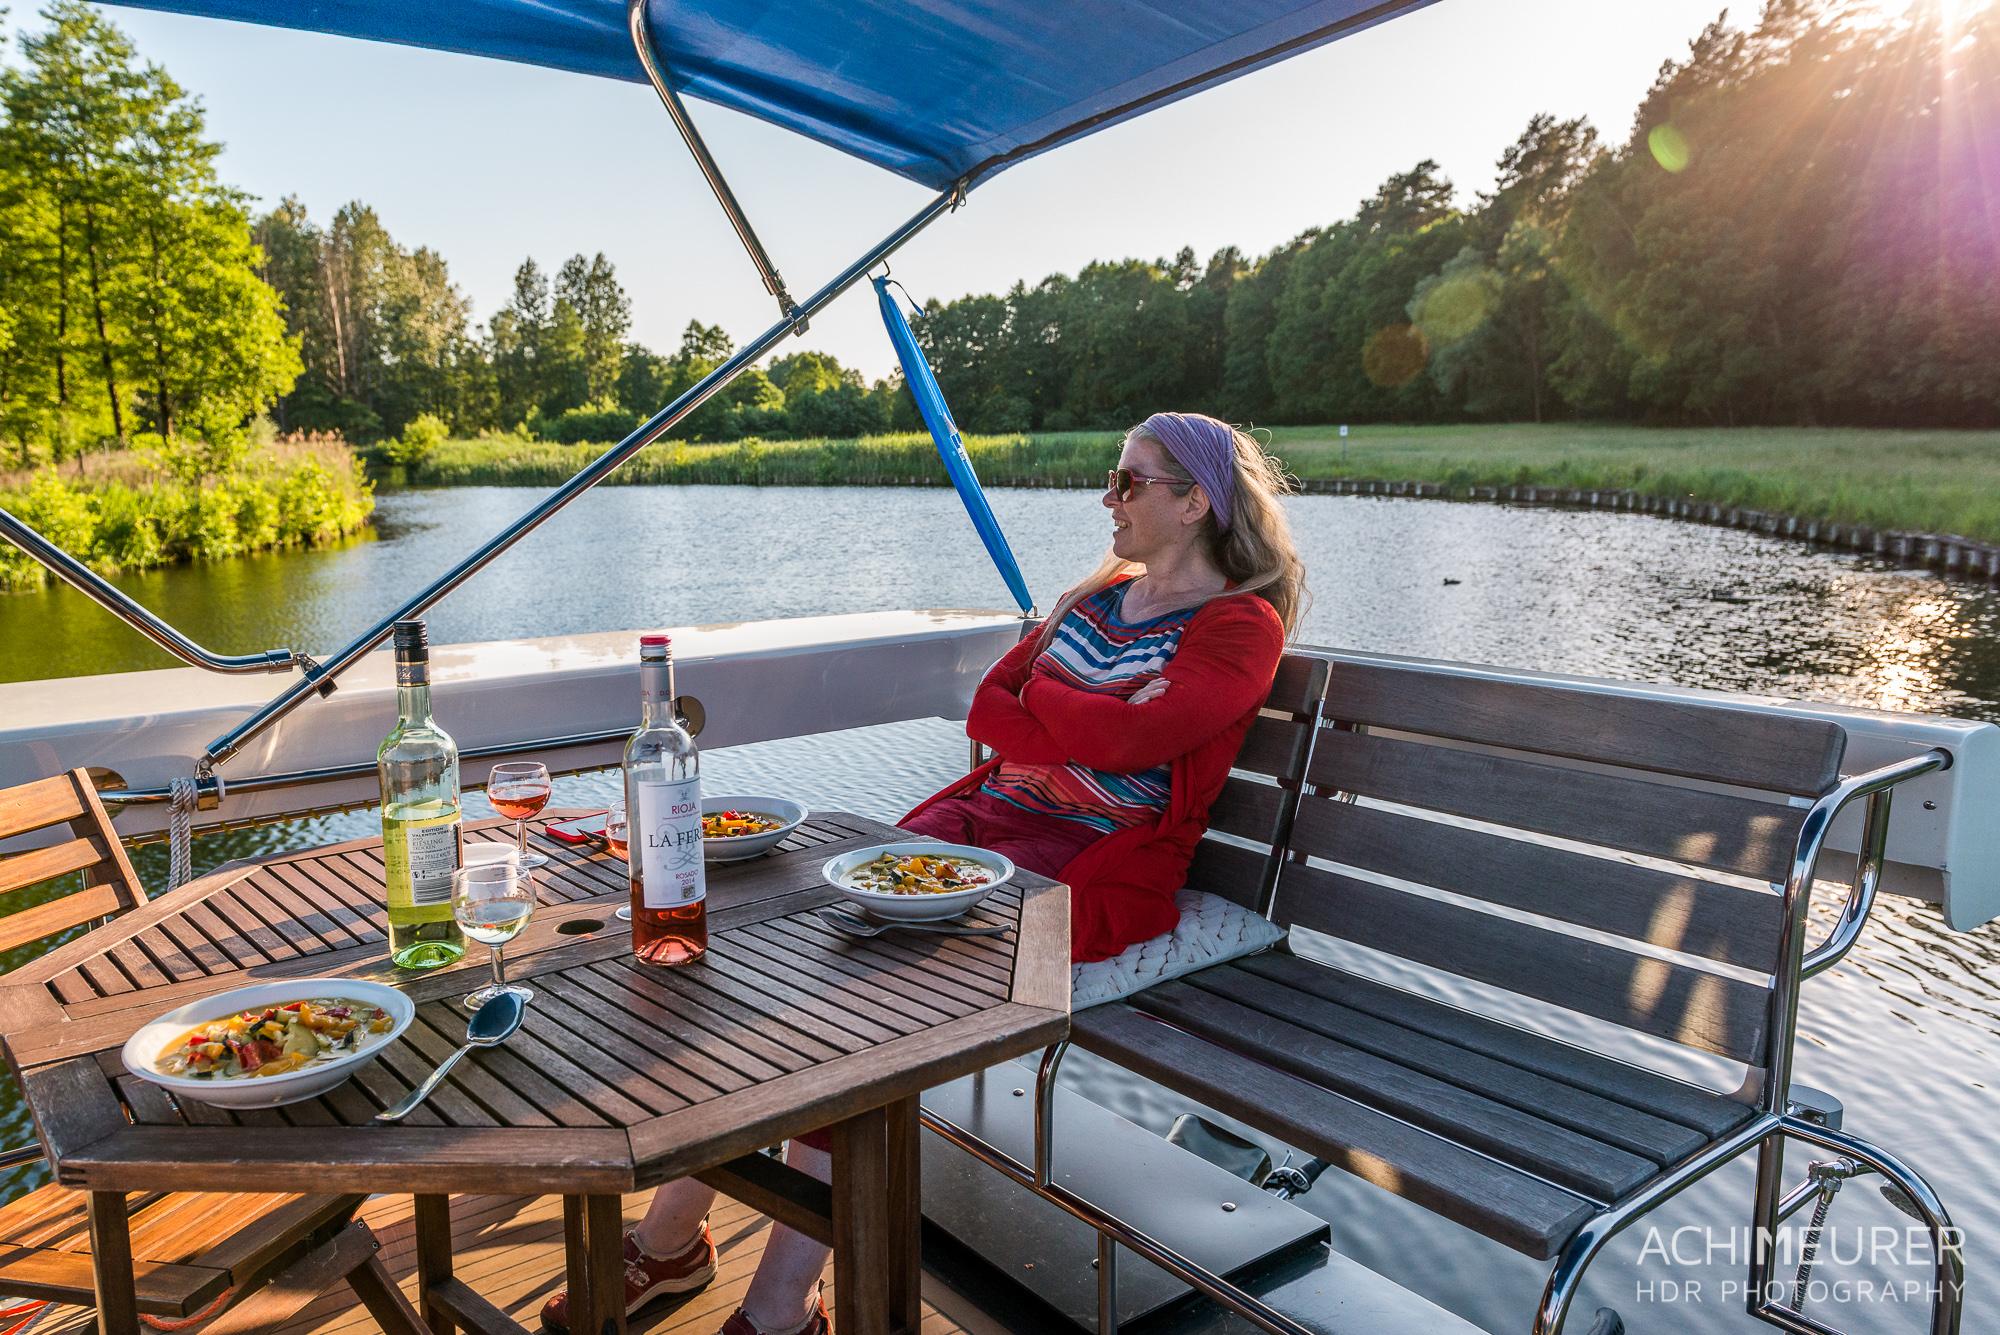 Hausboot-Kuhnle-Mueritz-Mecklenburg-Vorpommern-See_3346